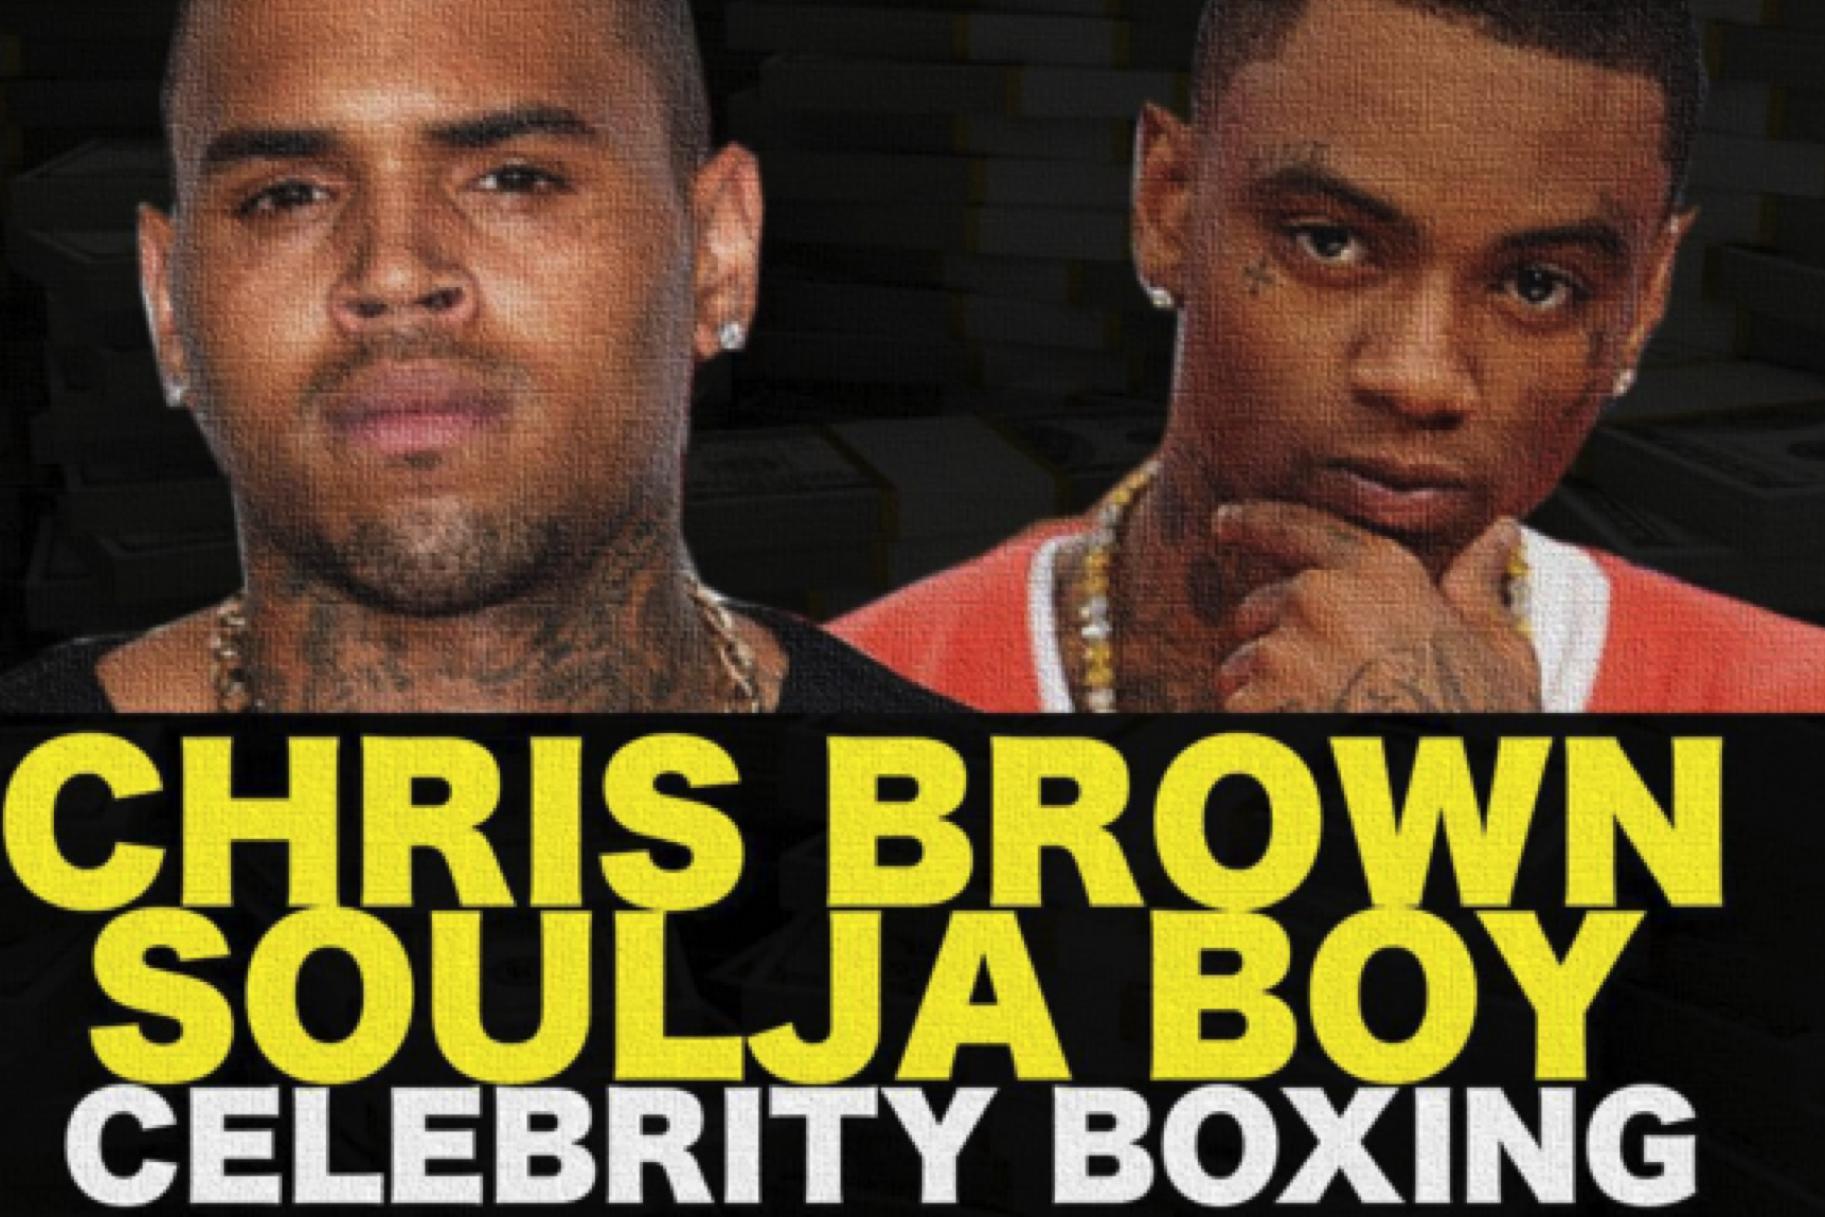 Soulja Boy y Chris Brown pelearán en Pay-Per-View gracias a Floyd Mayweather